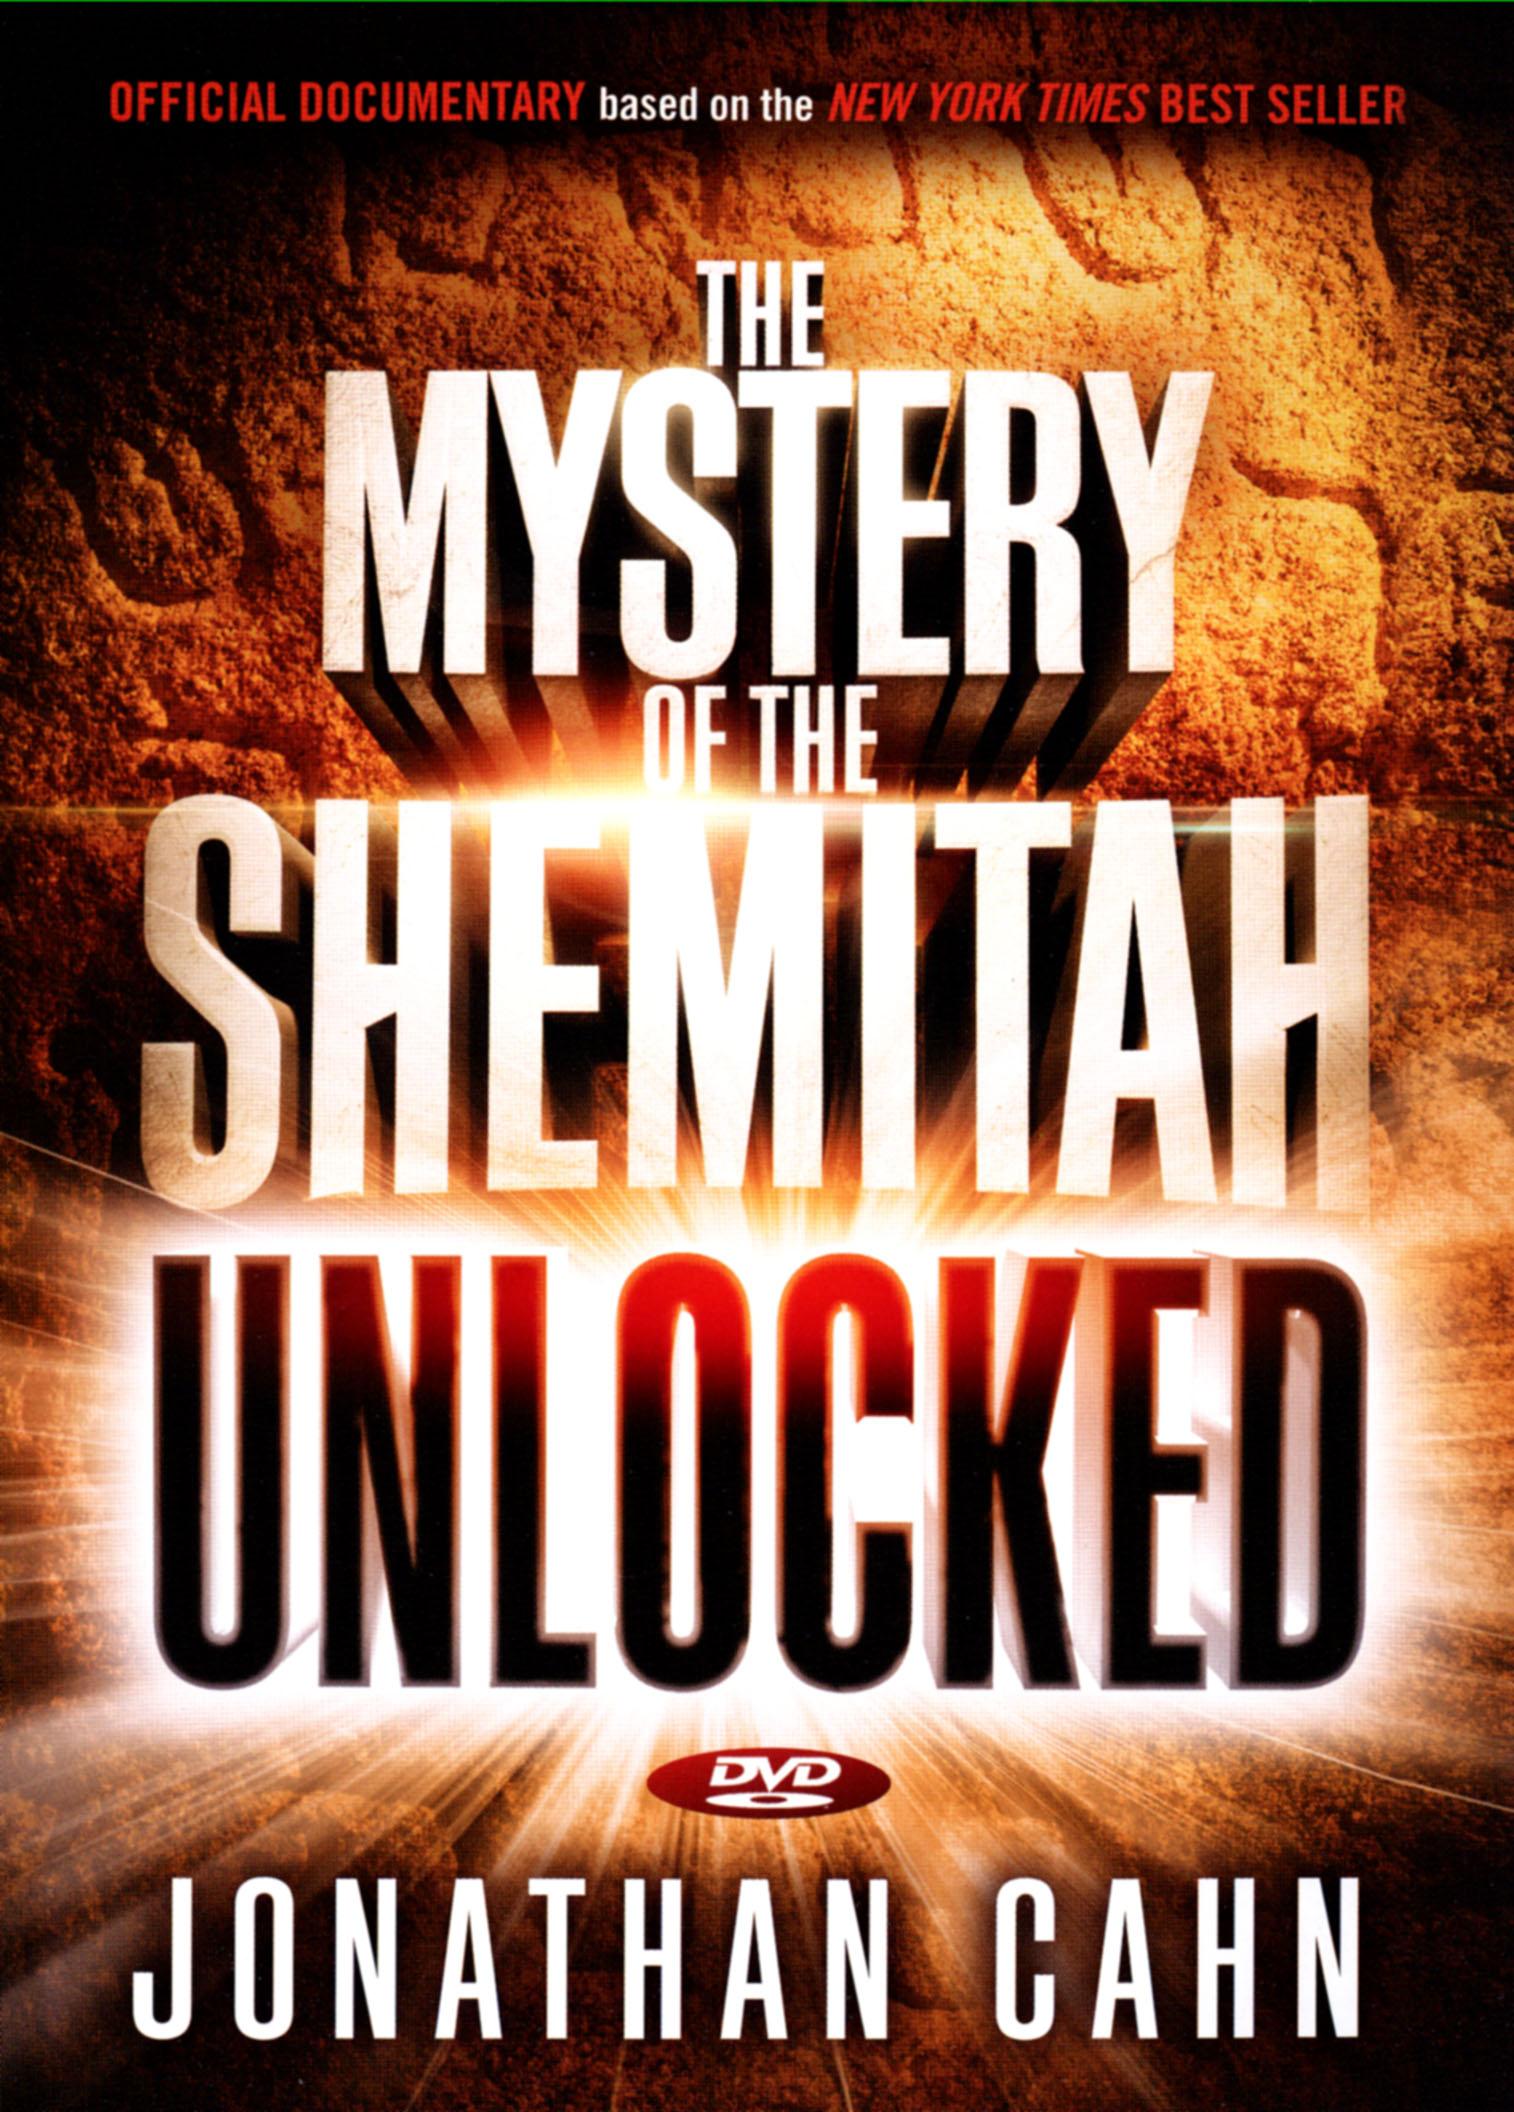 Jonathan Cahn: The Mystery of the Shemitah Unlocked